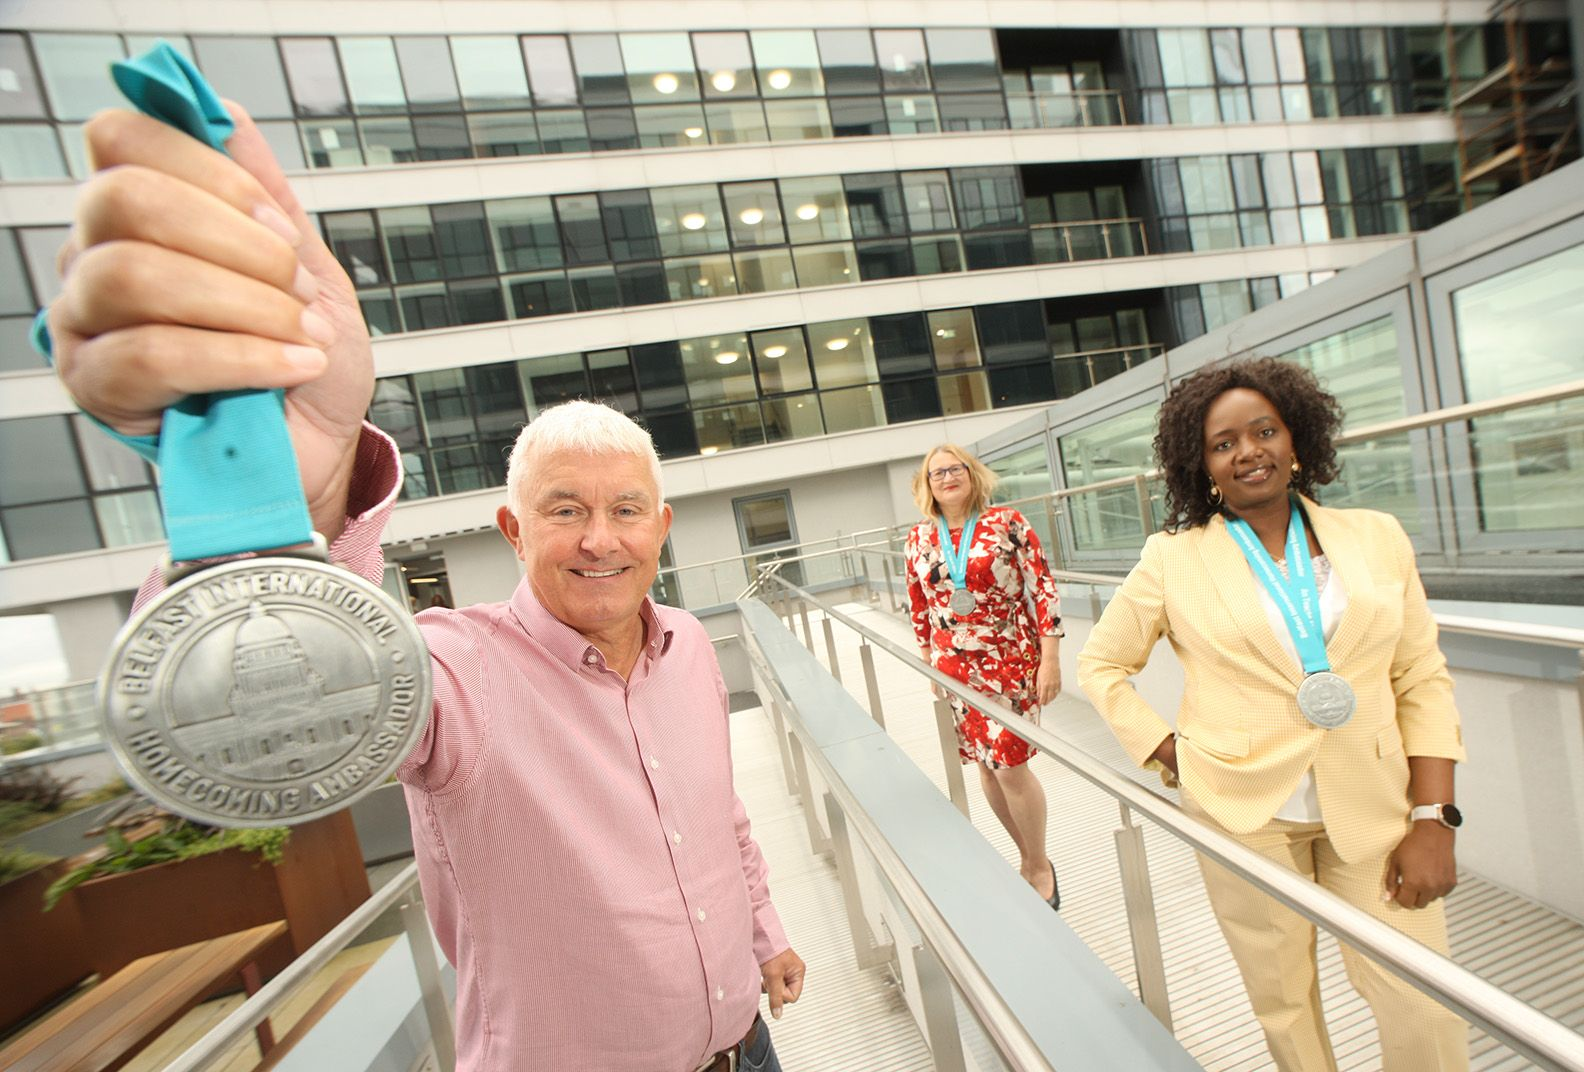 A RICHER NEIGHBOURHOOD: Brendan Monaghan, CEO of Homecoming business partners Neuda, with Belfast-based ambassadors Barbara Snowarska, a native of Poland, and Donna Nalongo Namukasa who hails from Uganda